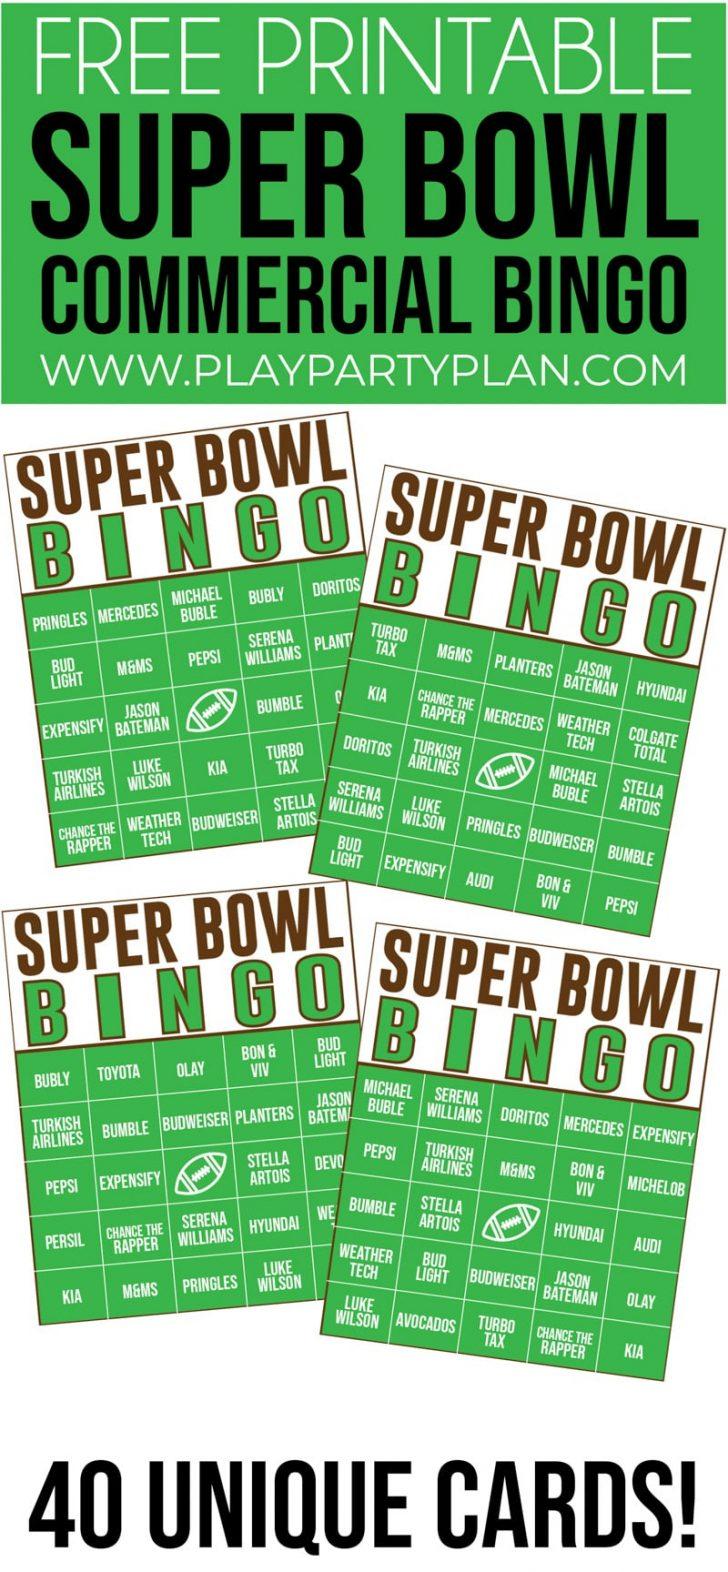 Printable Super Bowl Commercial Bingo Cards